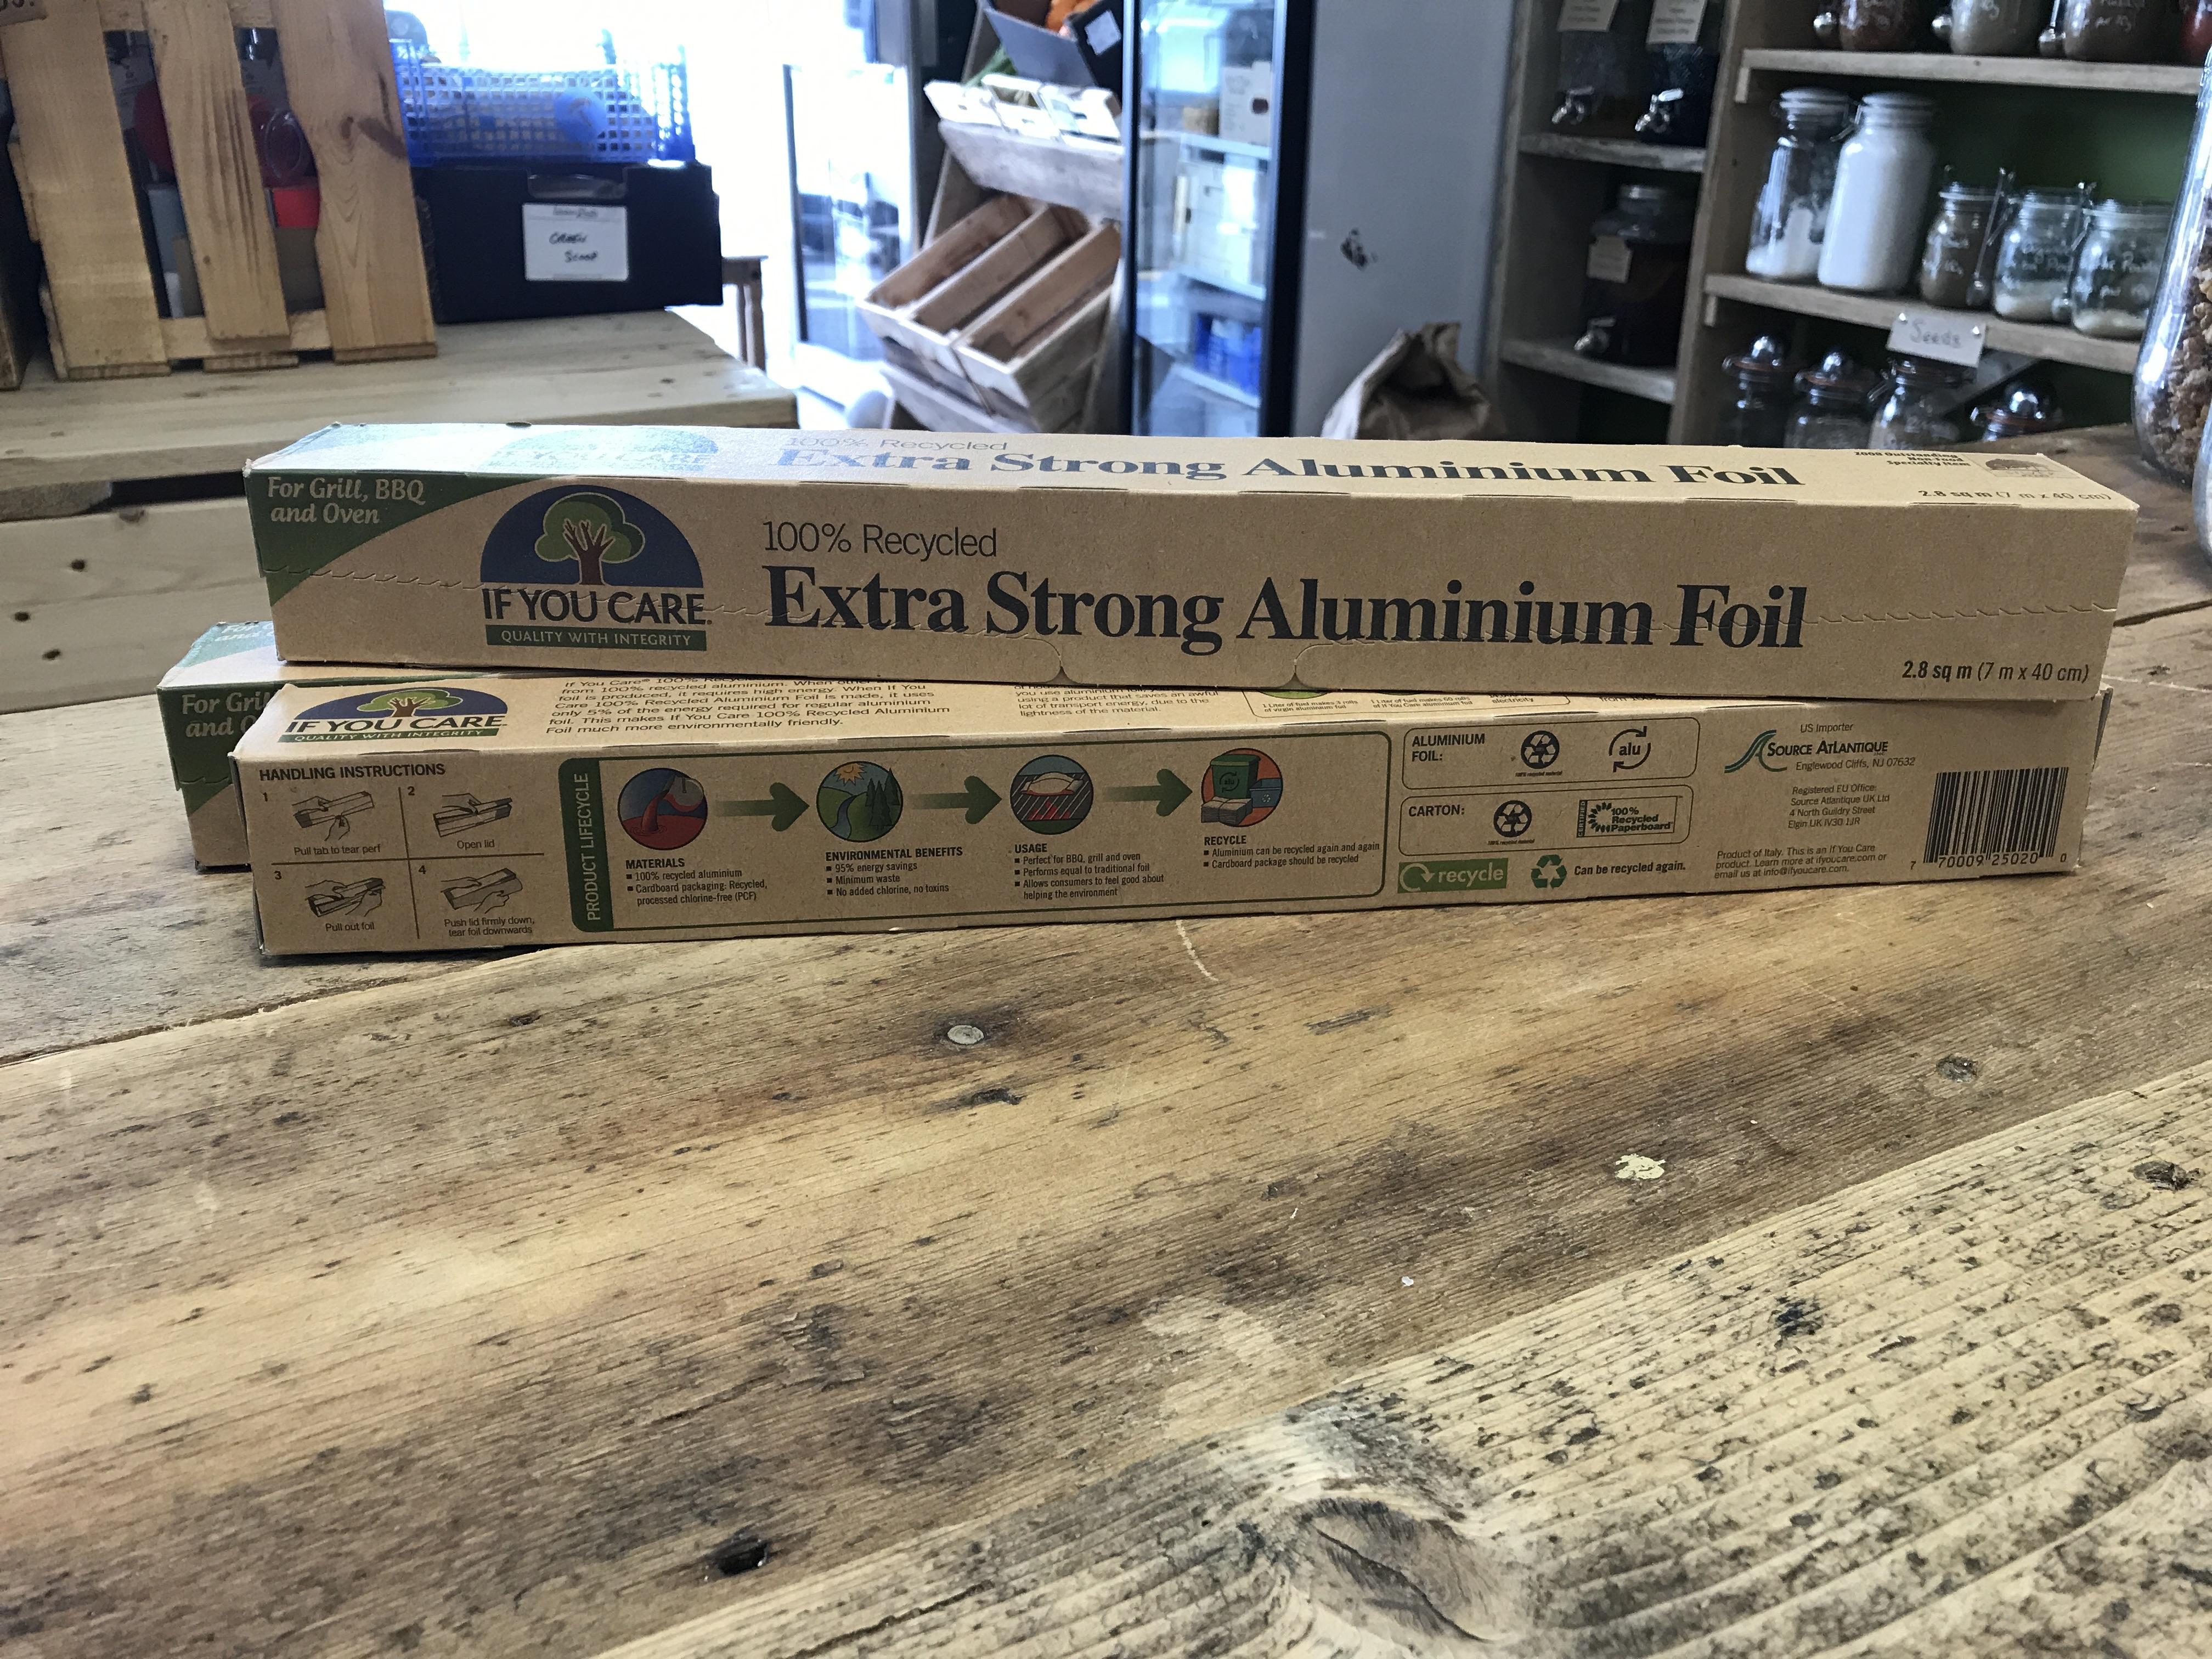 Extra Strong Aluminium Foil